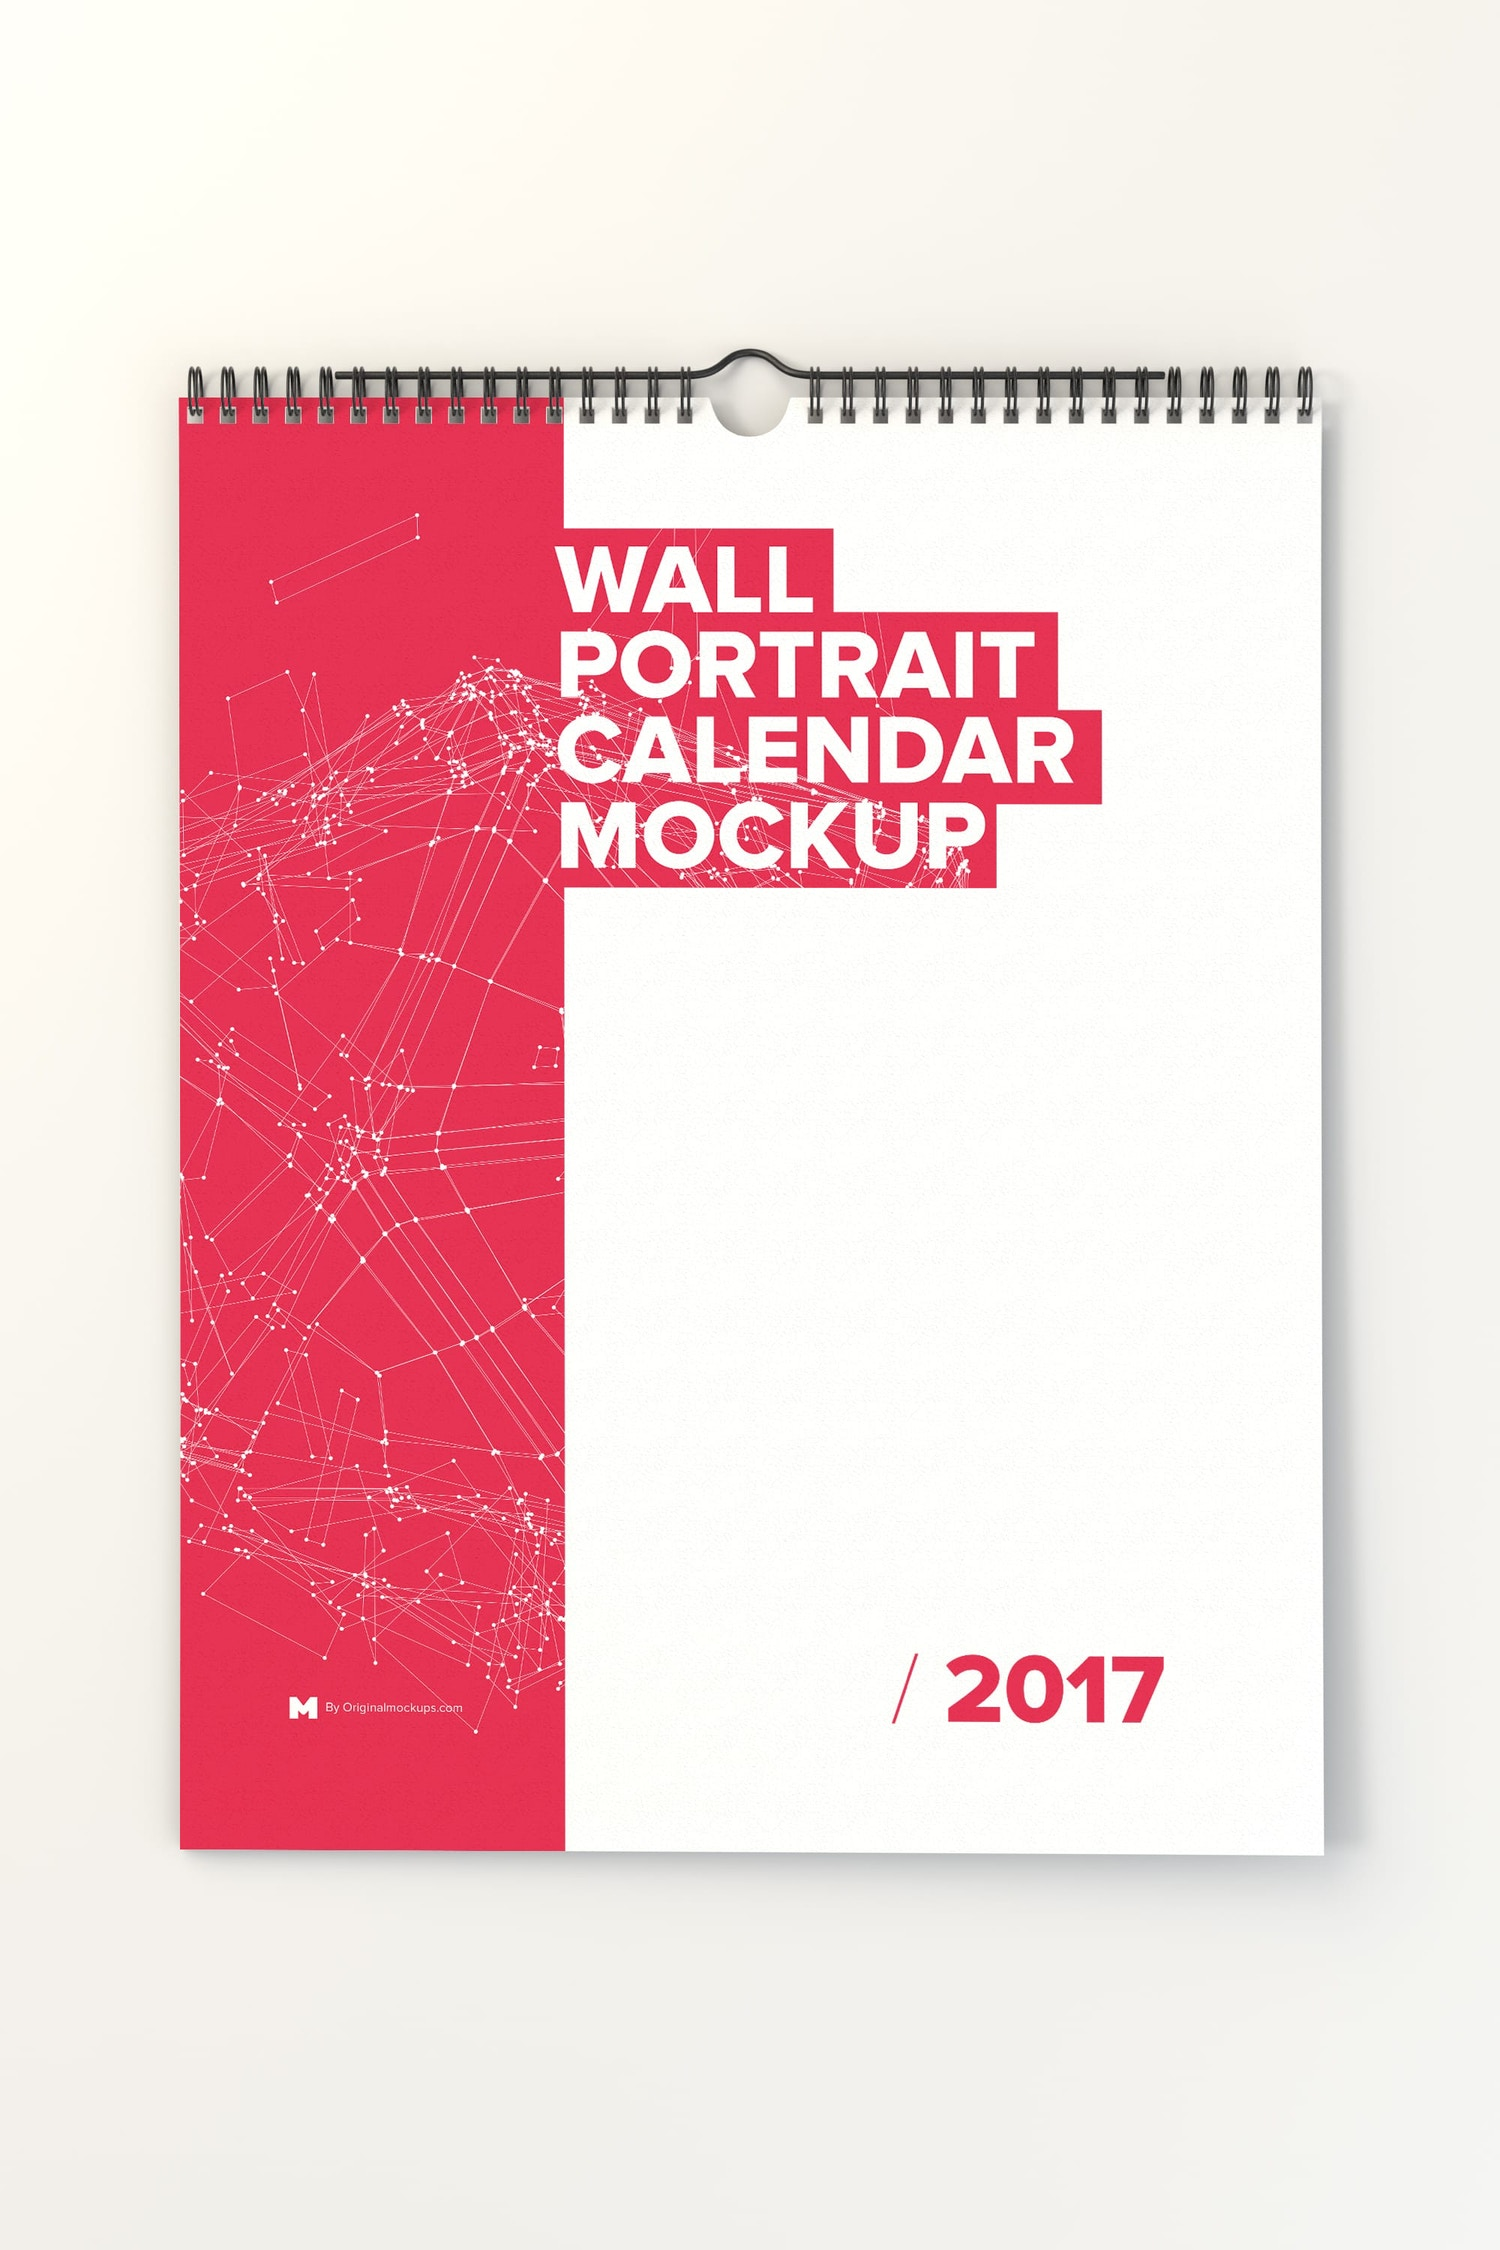 Wall Portrait Calendar Mockup